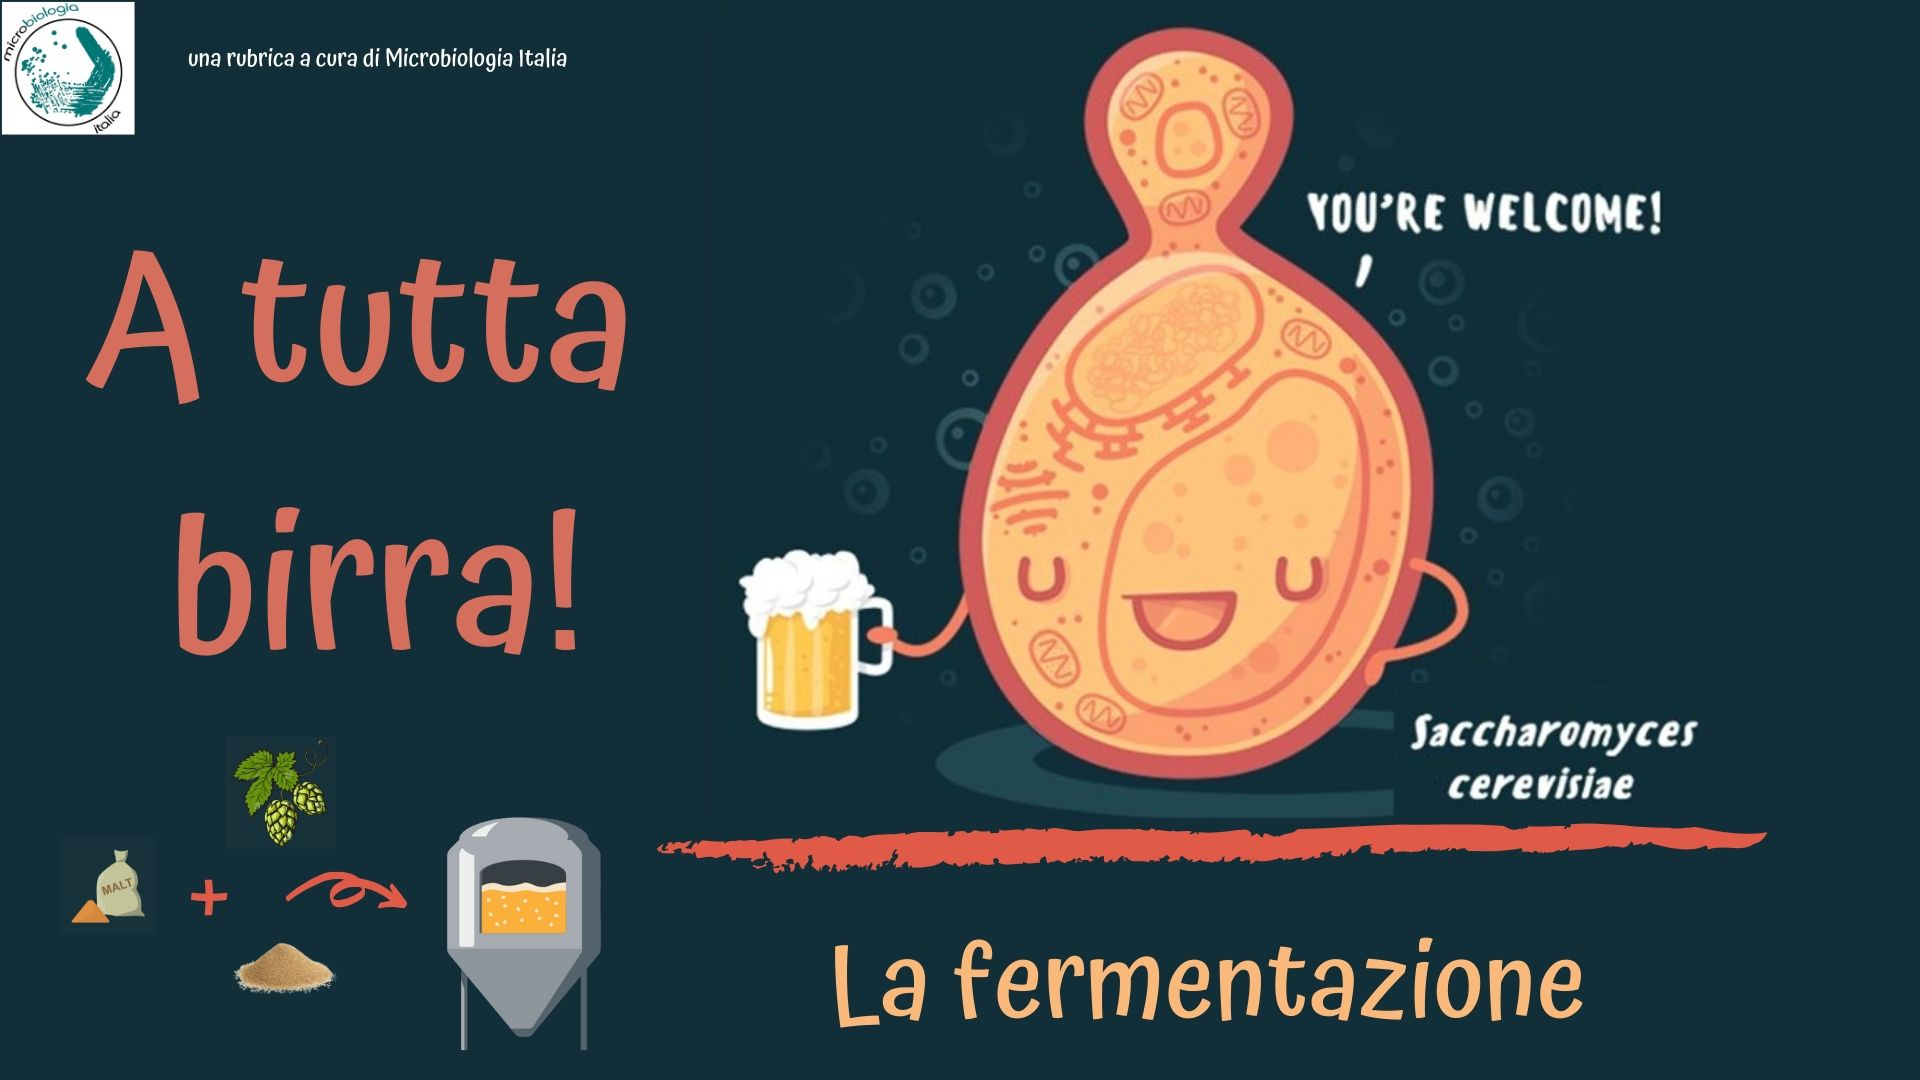 a tutta birra! - la fermentazione a cura di microbiologia italia